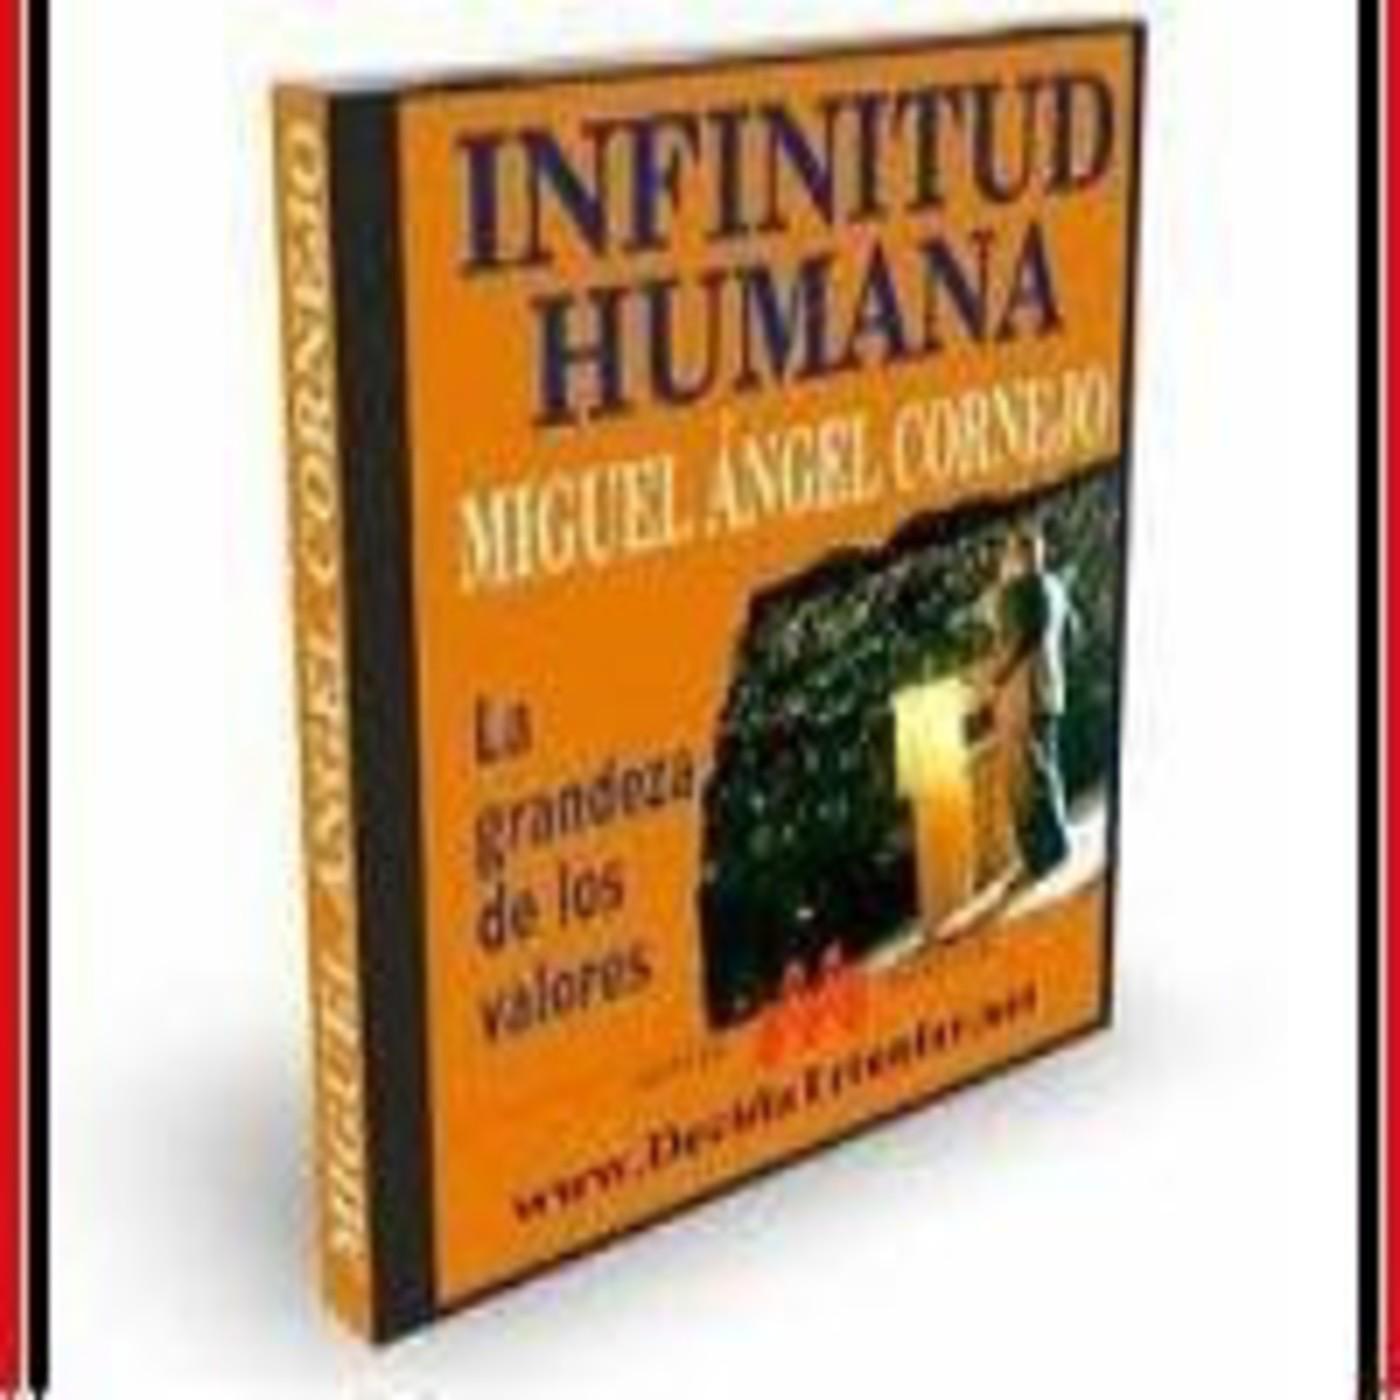 [01/01]Infinitud Humana - Miguel Angel Cornejo